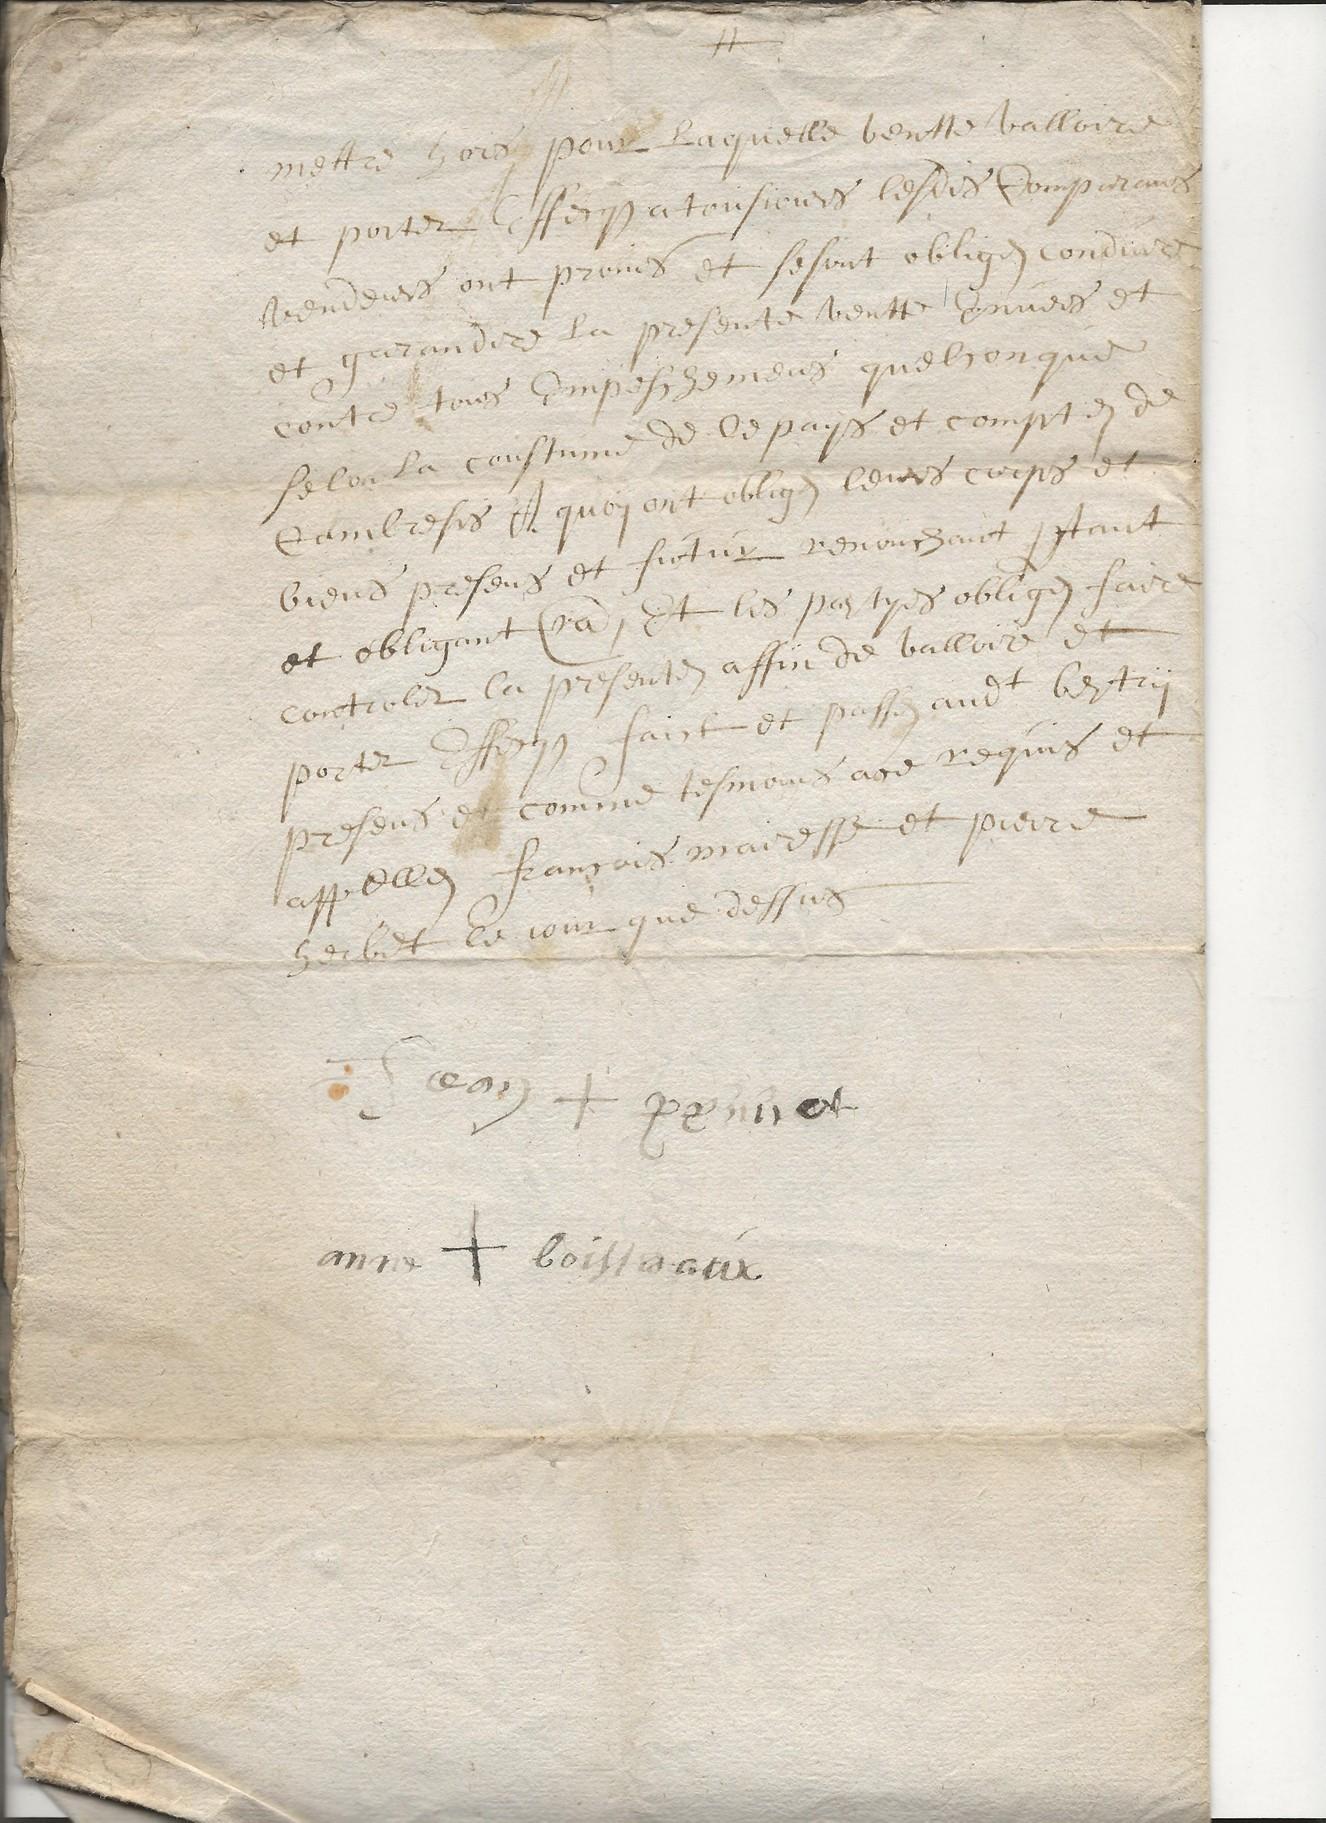 1697 acte concernant jean pruvot 3